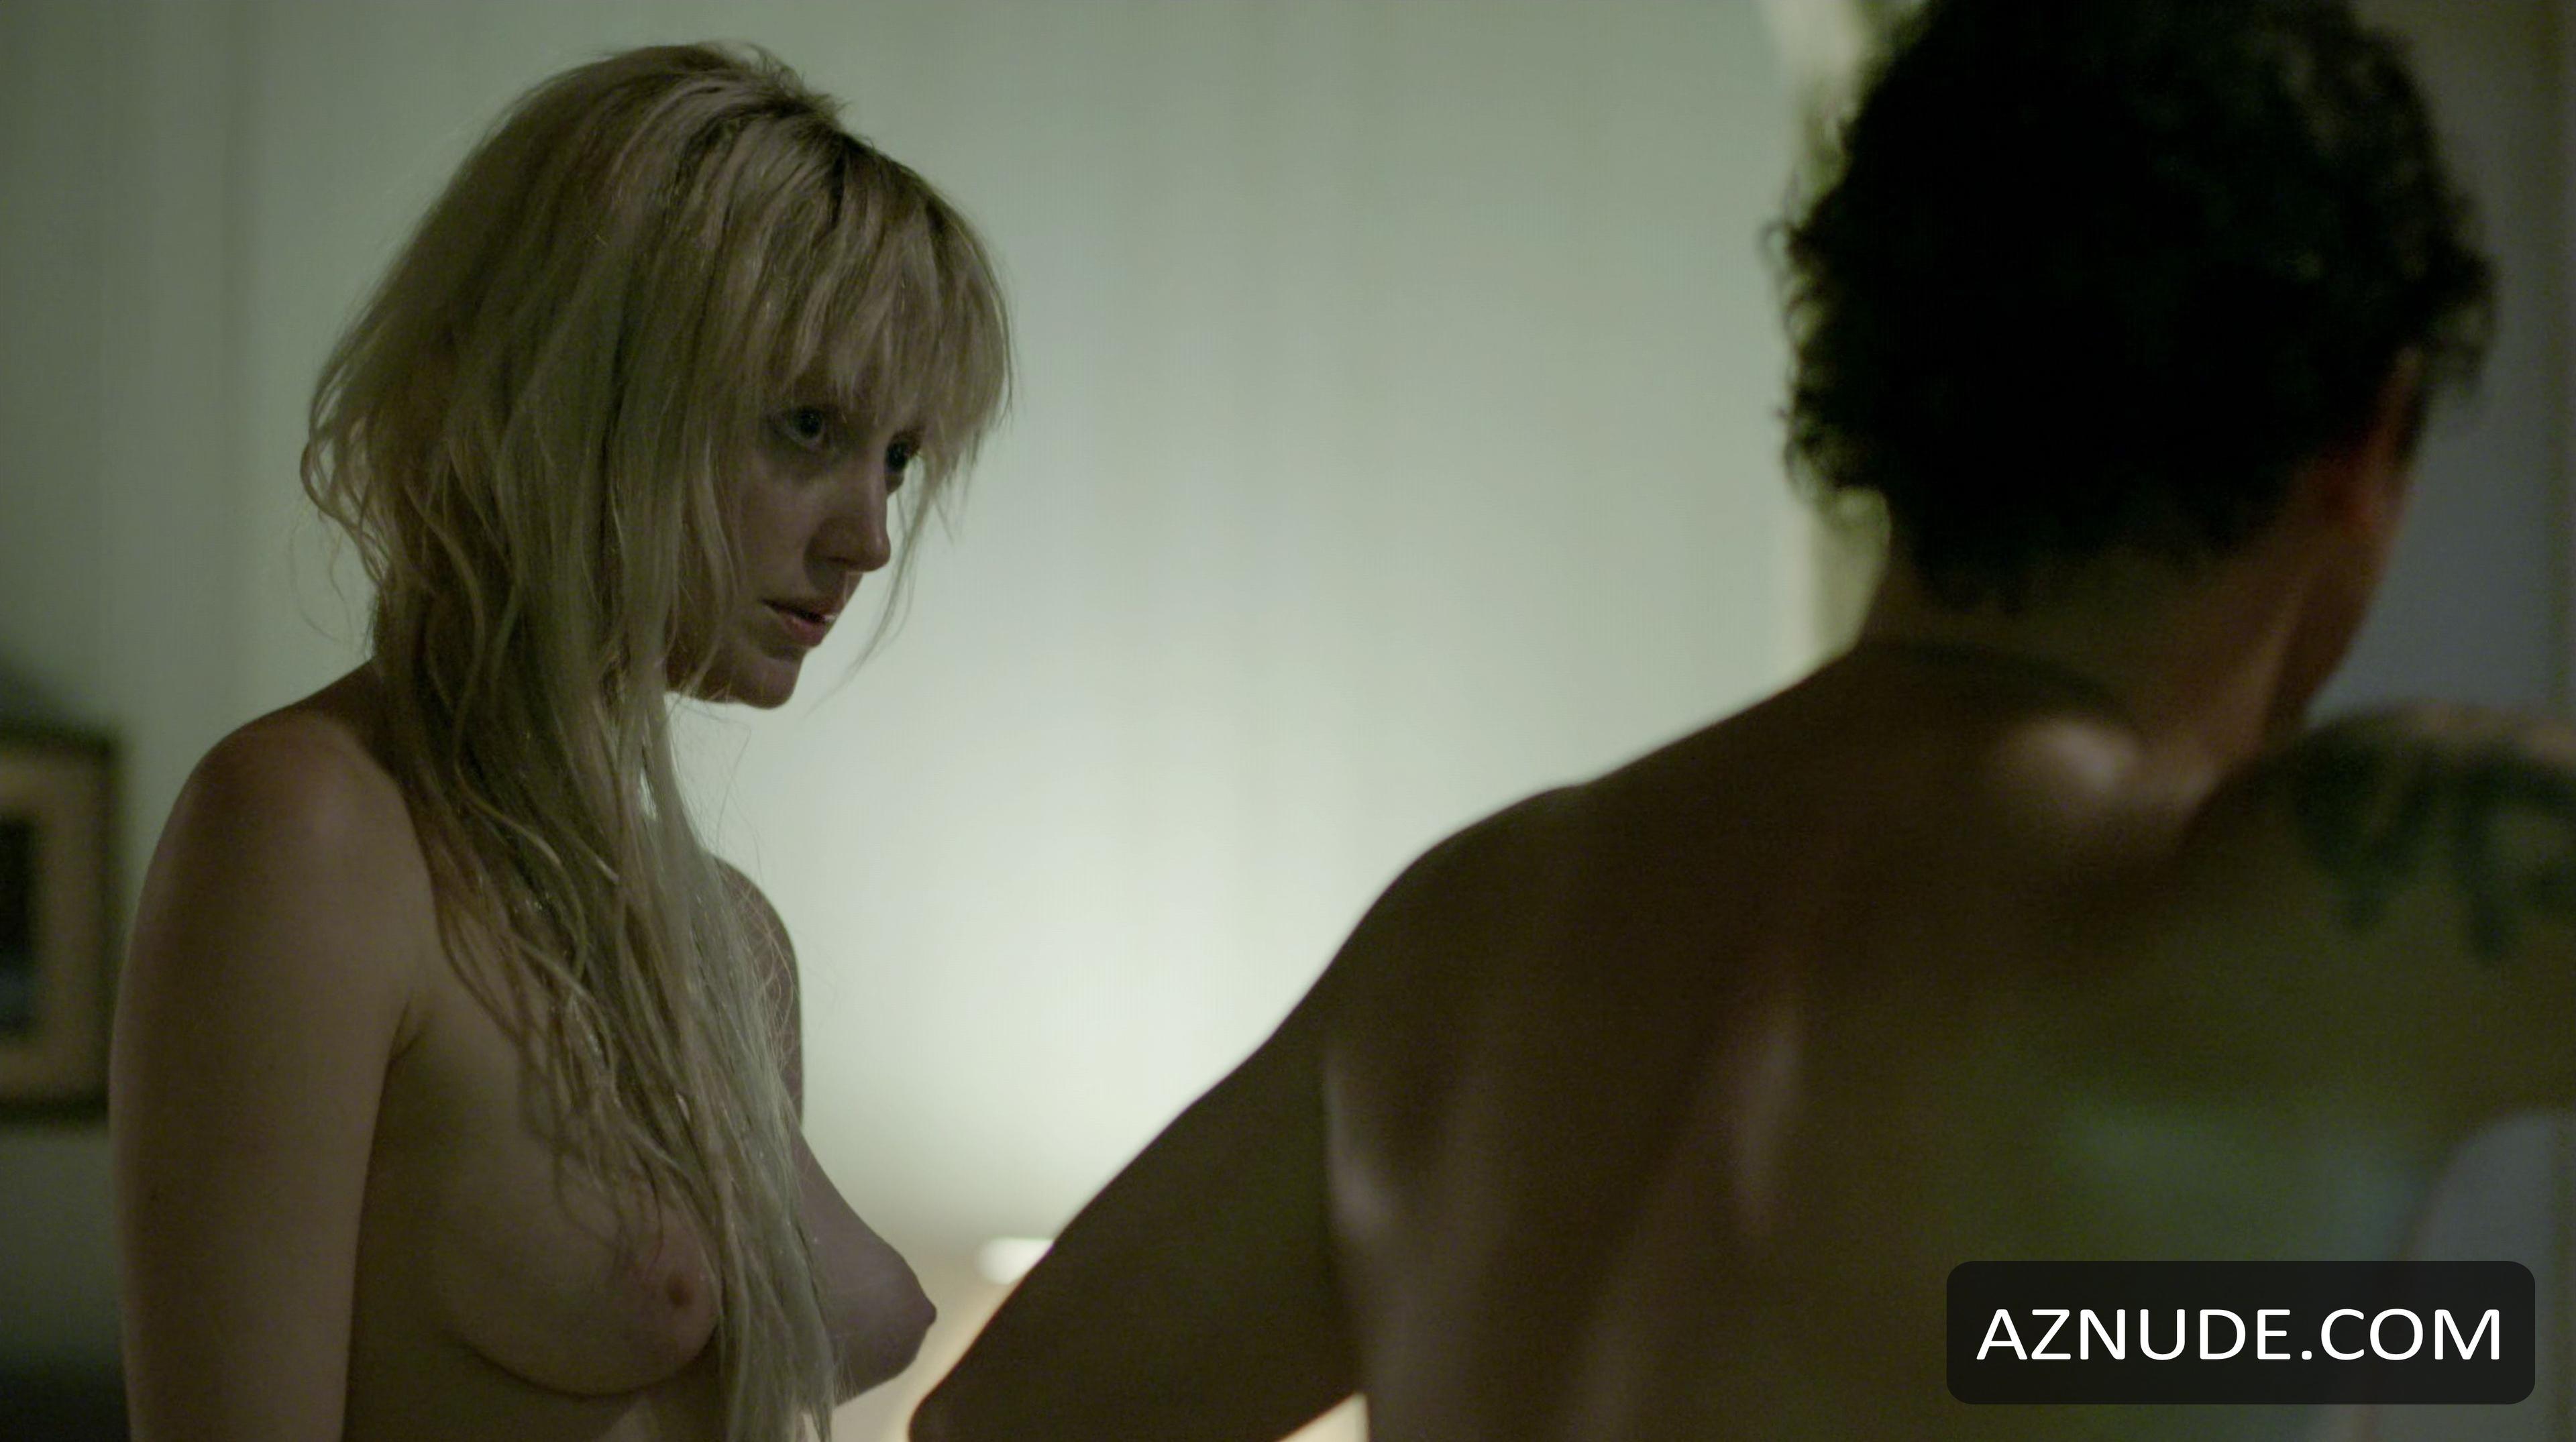 Hot nude lyndsy fonseca